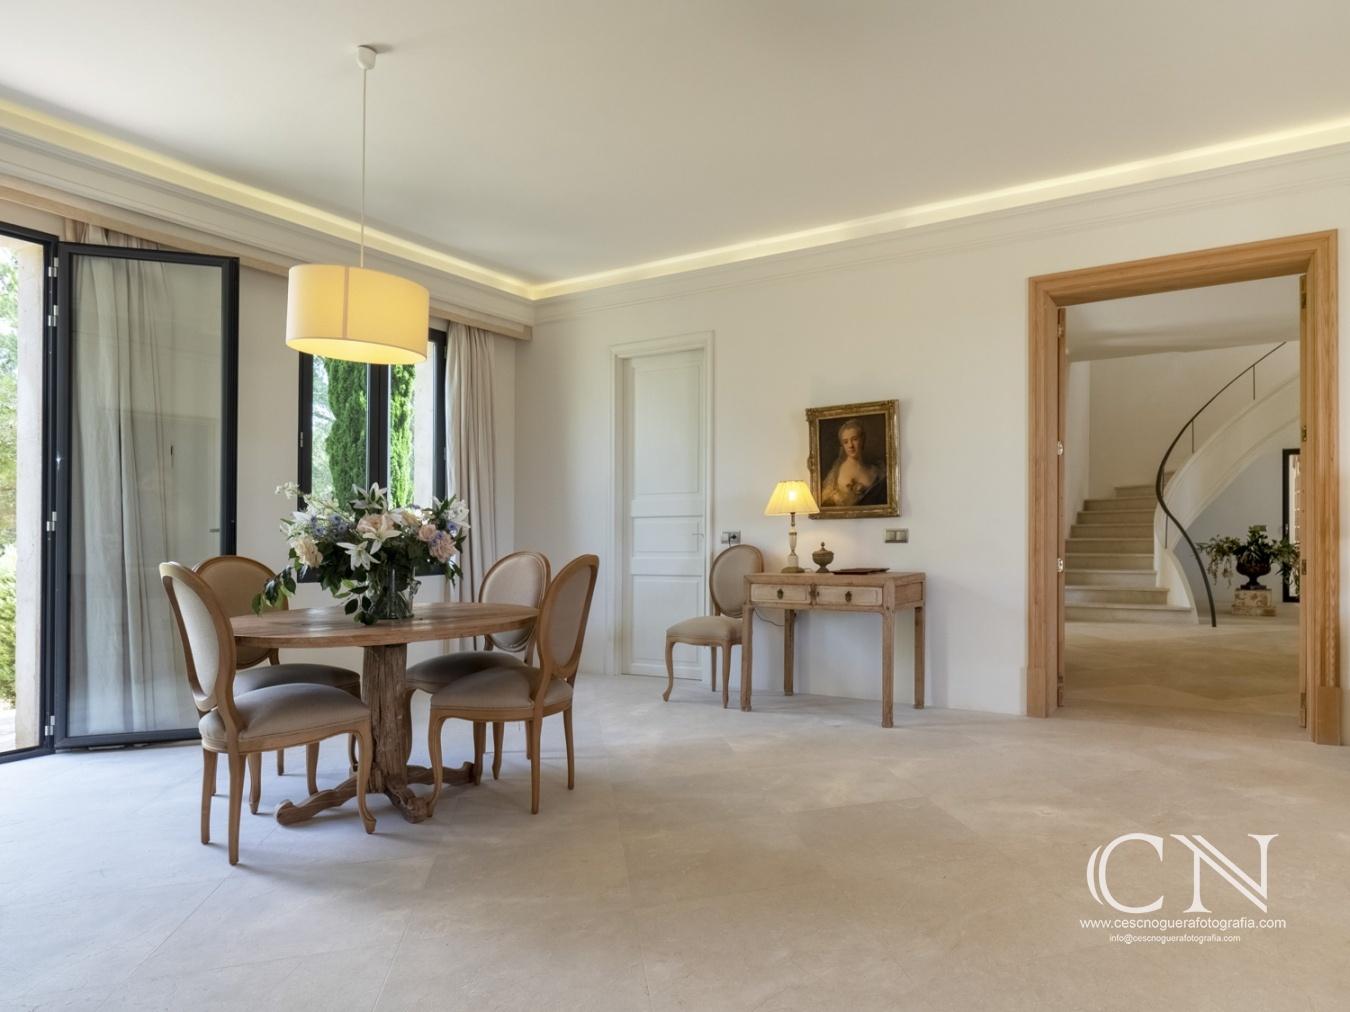 Villa en sa Rapita - Cesc Noguera Fotografia,  Architectural & Interior design photographer / Landscape Photography.